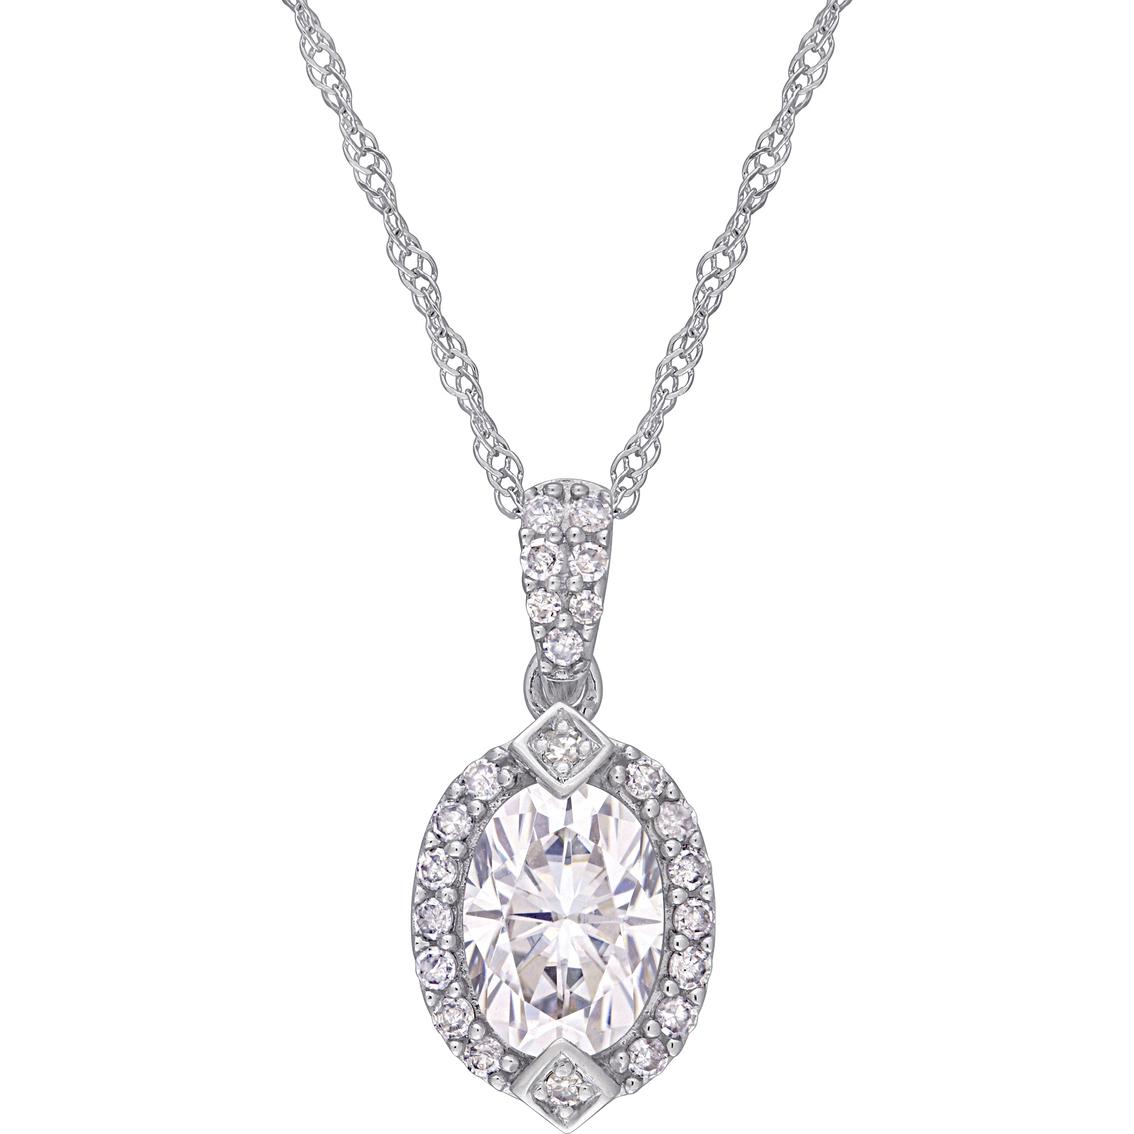 Bella Terra 10k White Gold 1 8 Ctw Diamond Halo Pendant